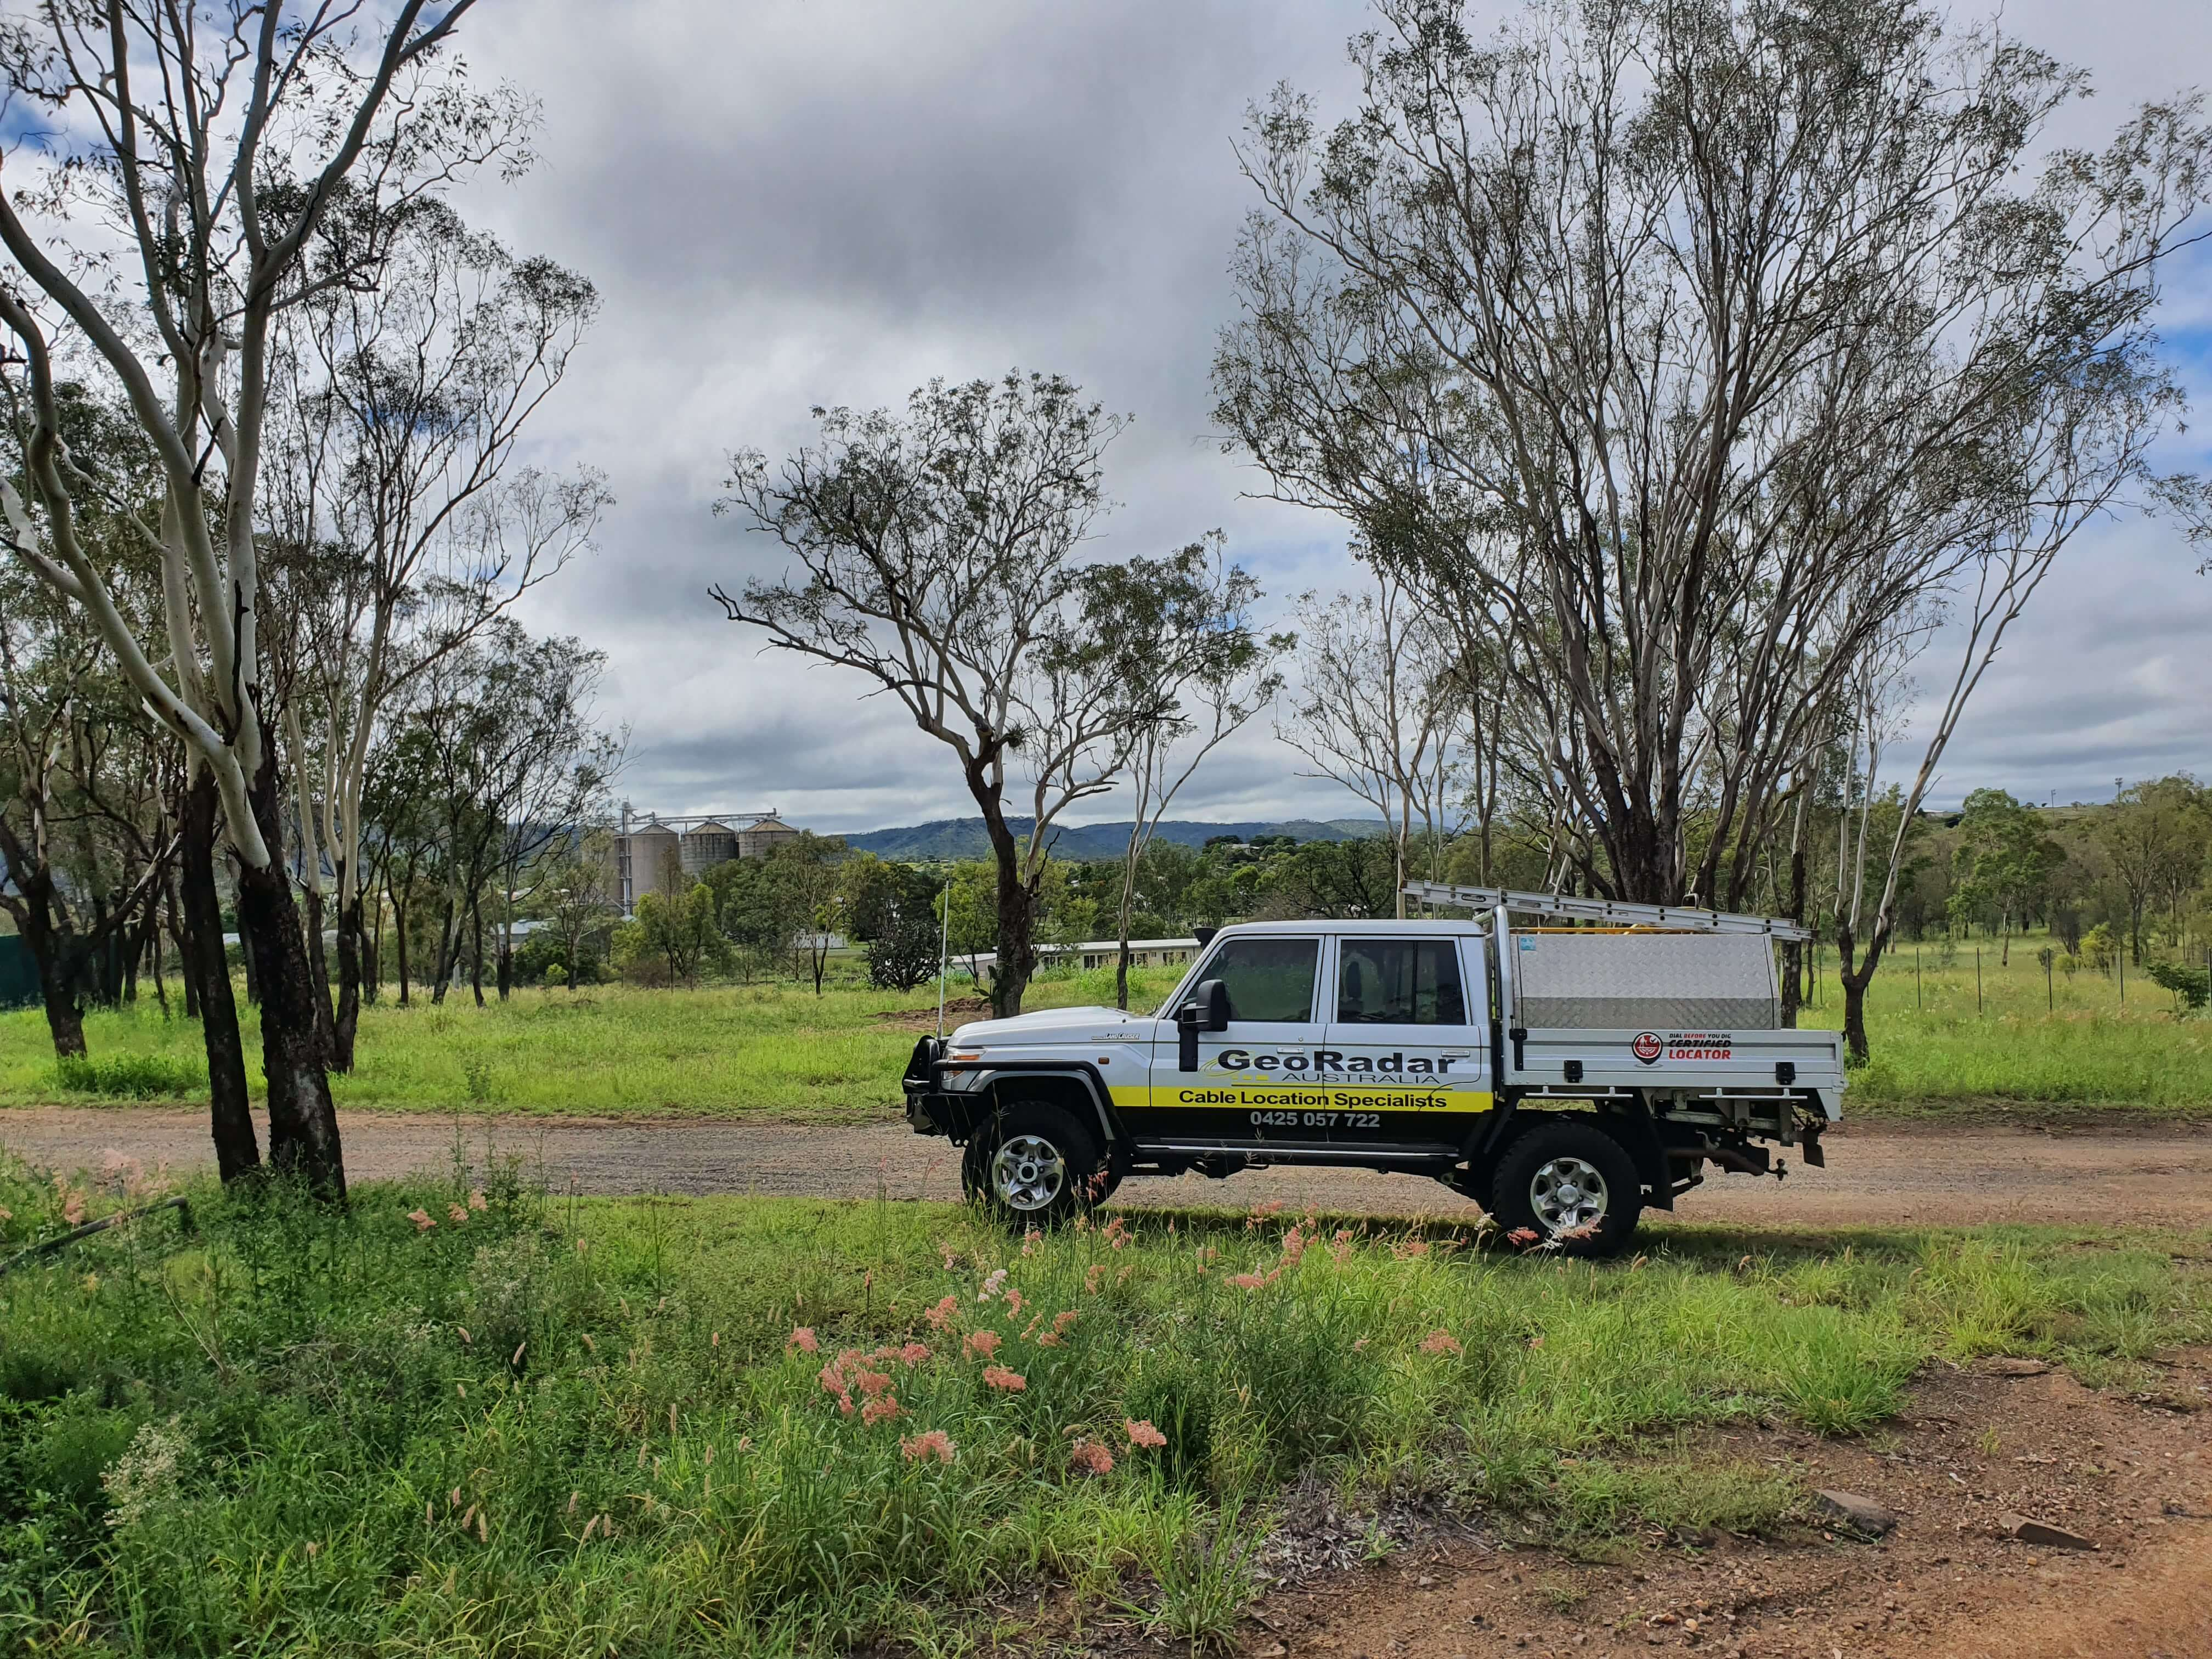 Geo-Radar-Australia-Opera-Duo-Underground-service-locator-Bundaberg